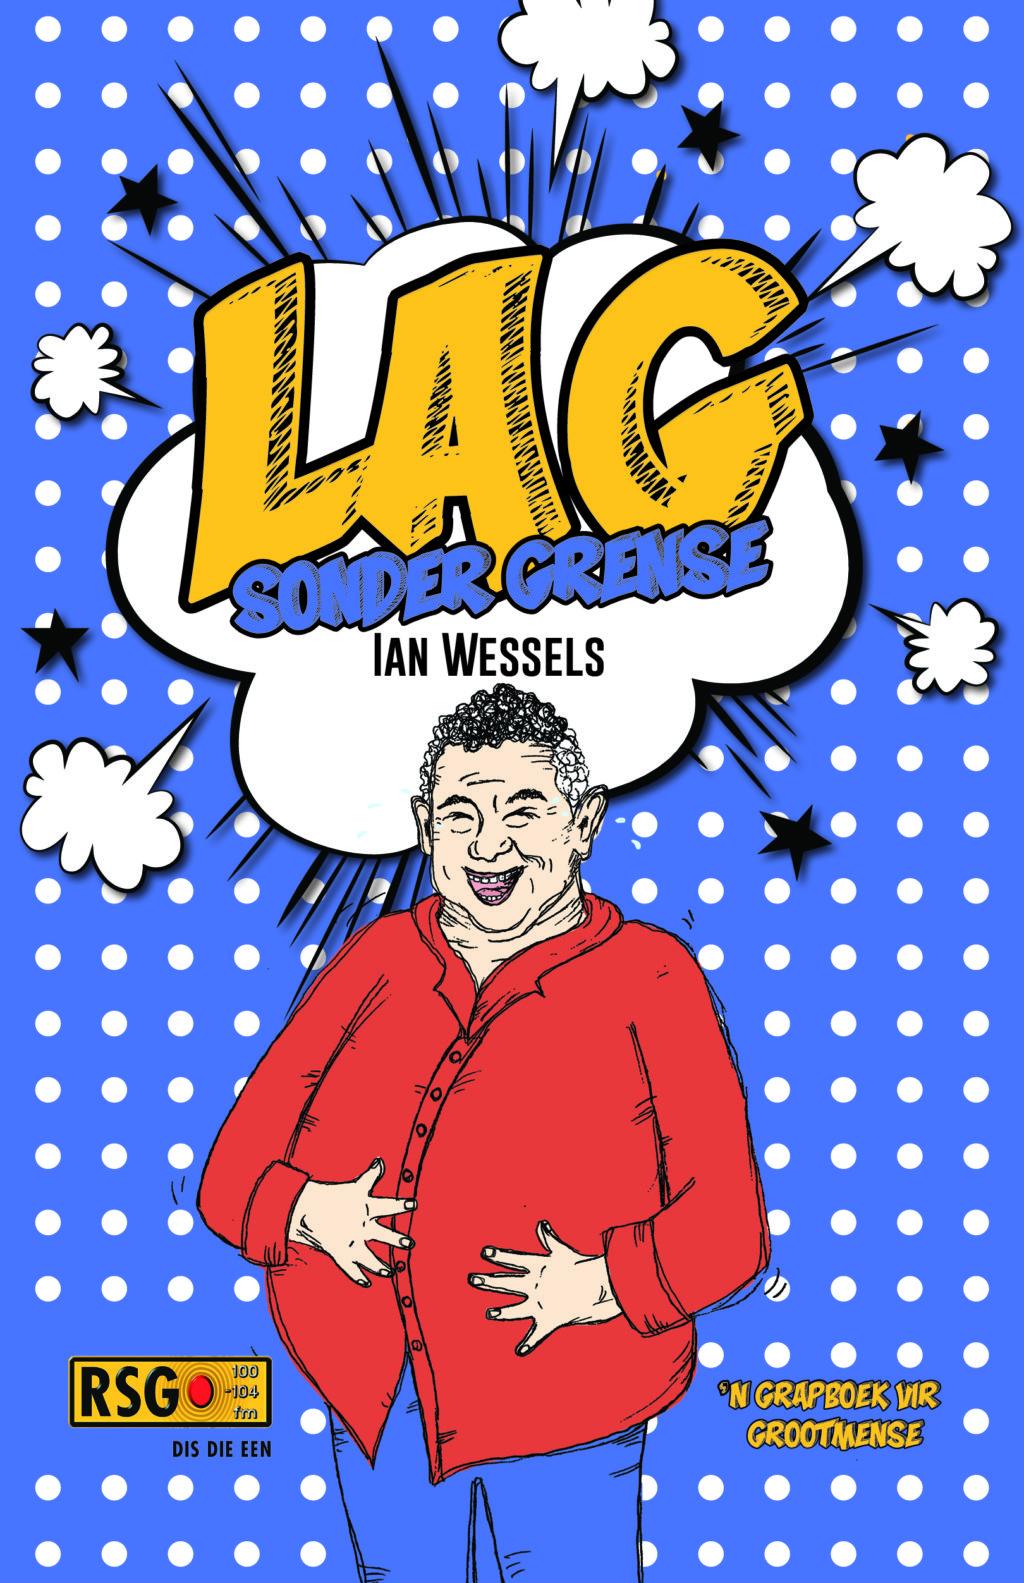 Ian Wessels se 'Lag Sonder Grense' nou op rak